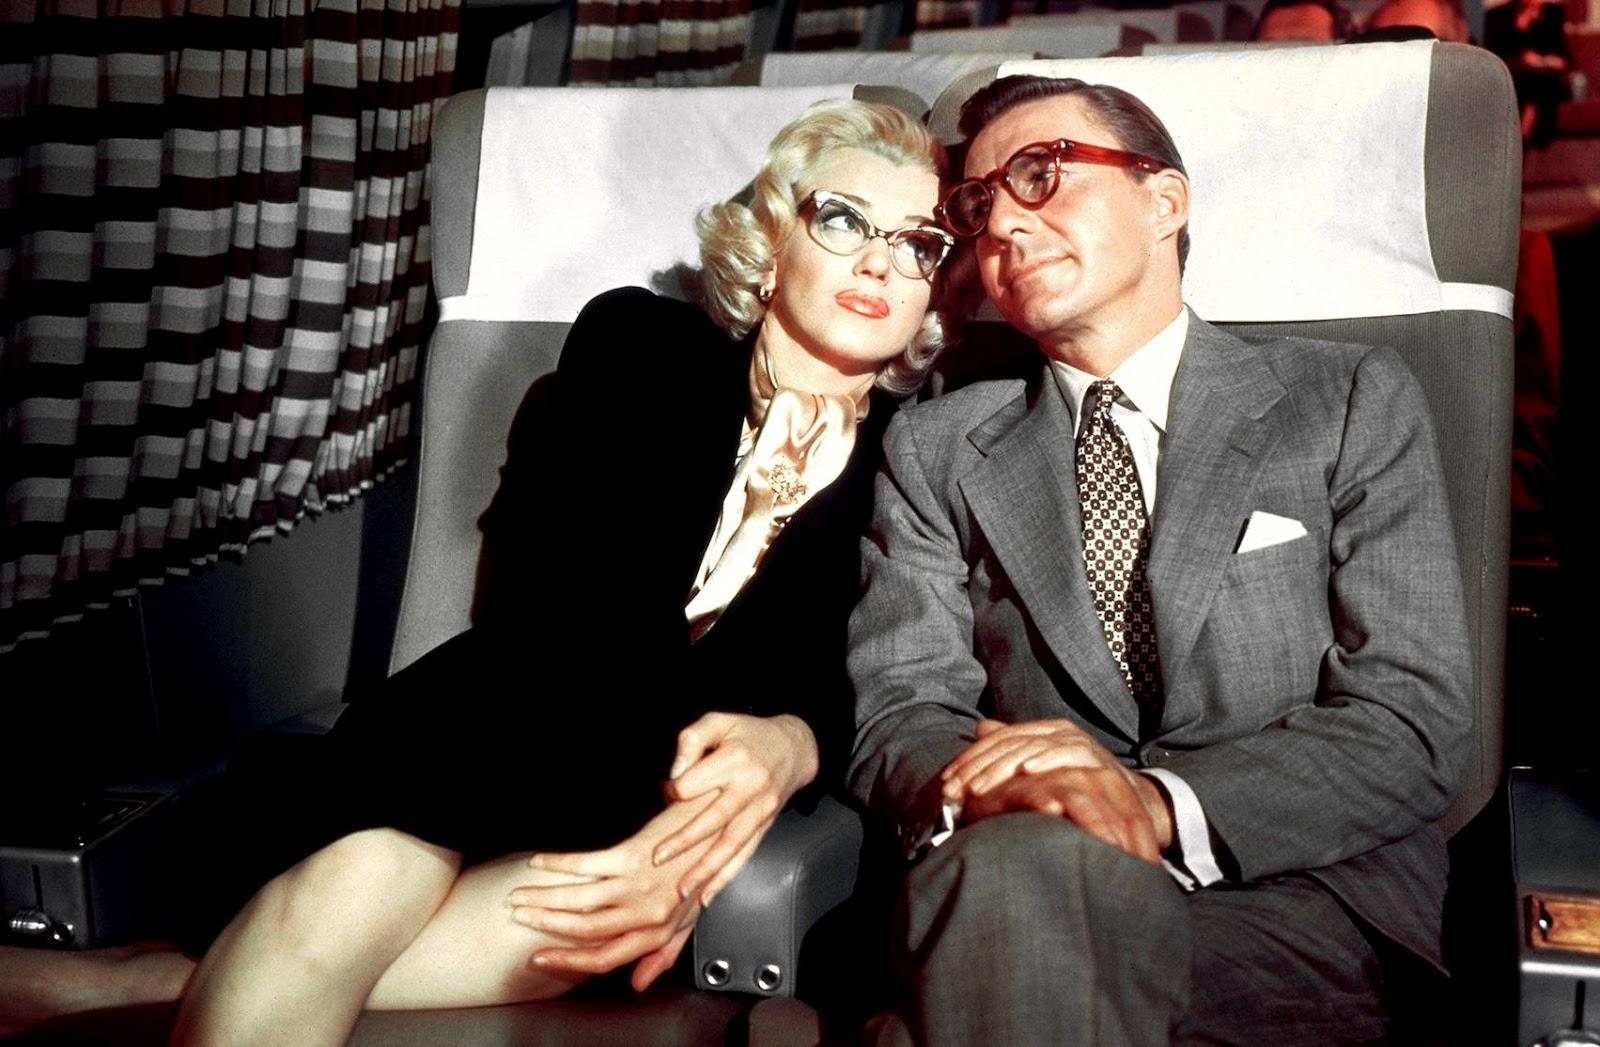 http://3.bp.blogspot.com/-p4ZQro4YH-Q/T50D218MD4I/AAAAAAAAVSU/oX9YFY_iUoA/s1600/Marilyn-Monroe-How-to-Marry-a-Millionaire.jpg